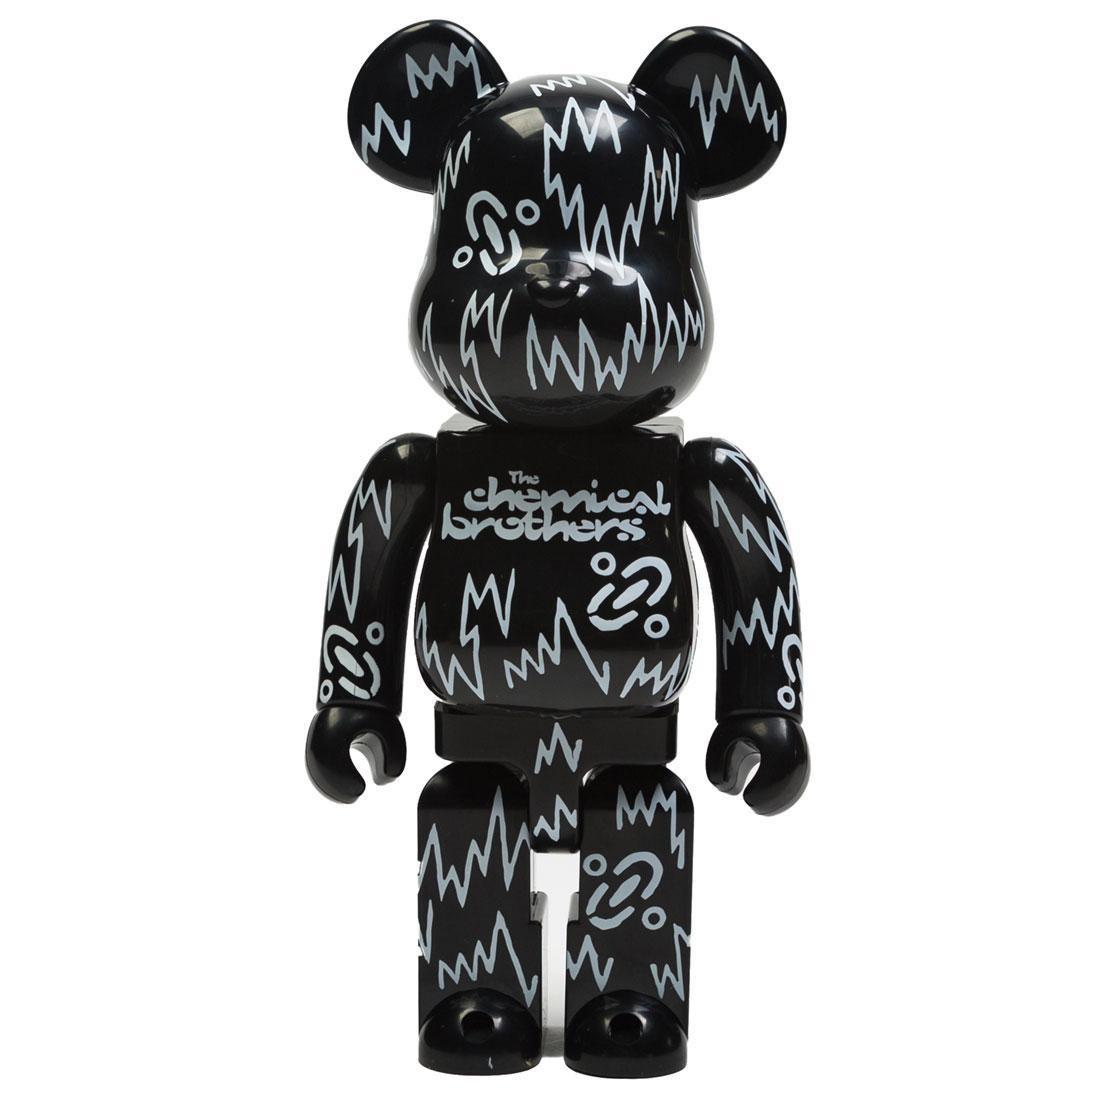 Medicom The Chemical Brothers 400% Bearbrick Figure (black)